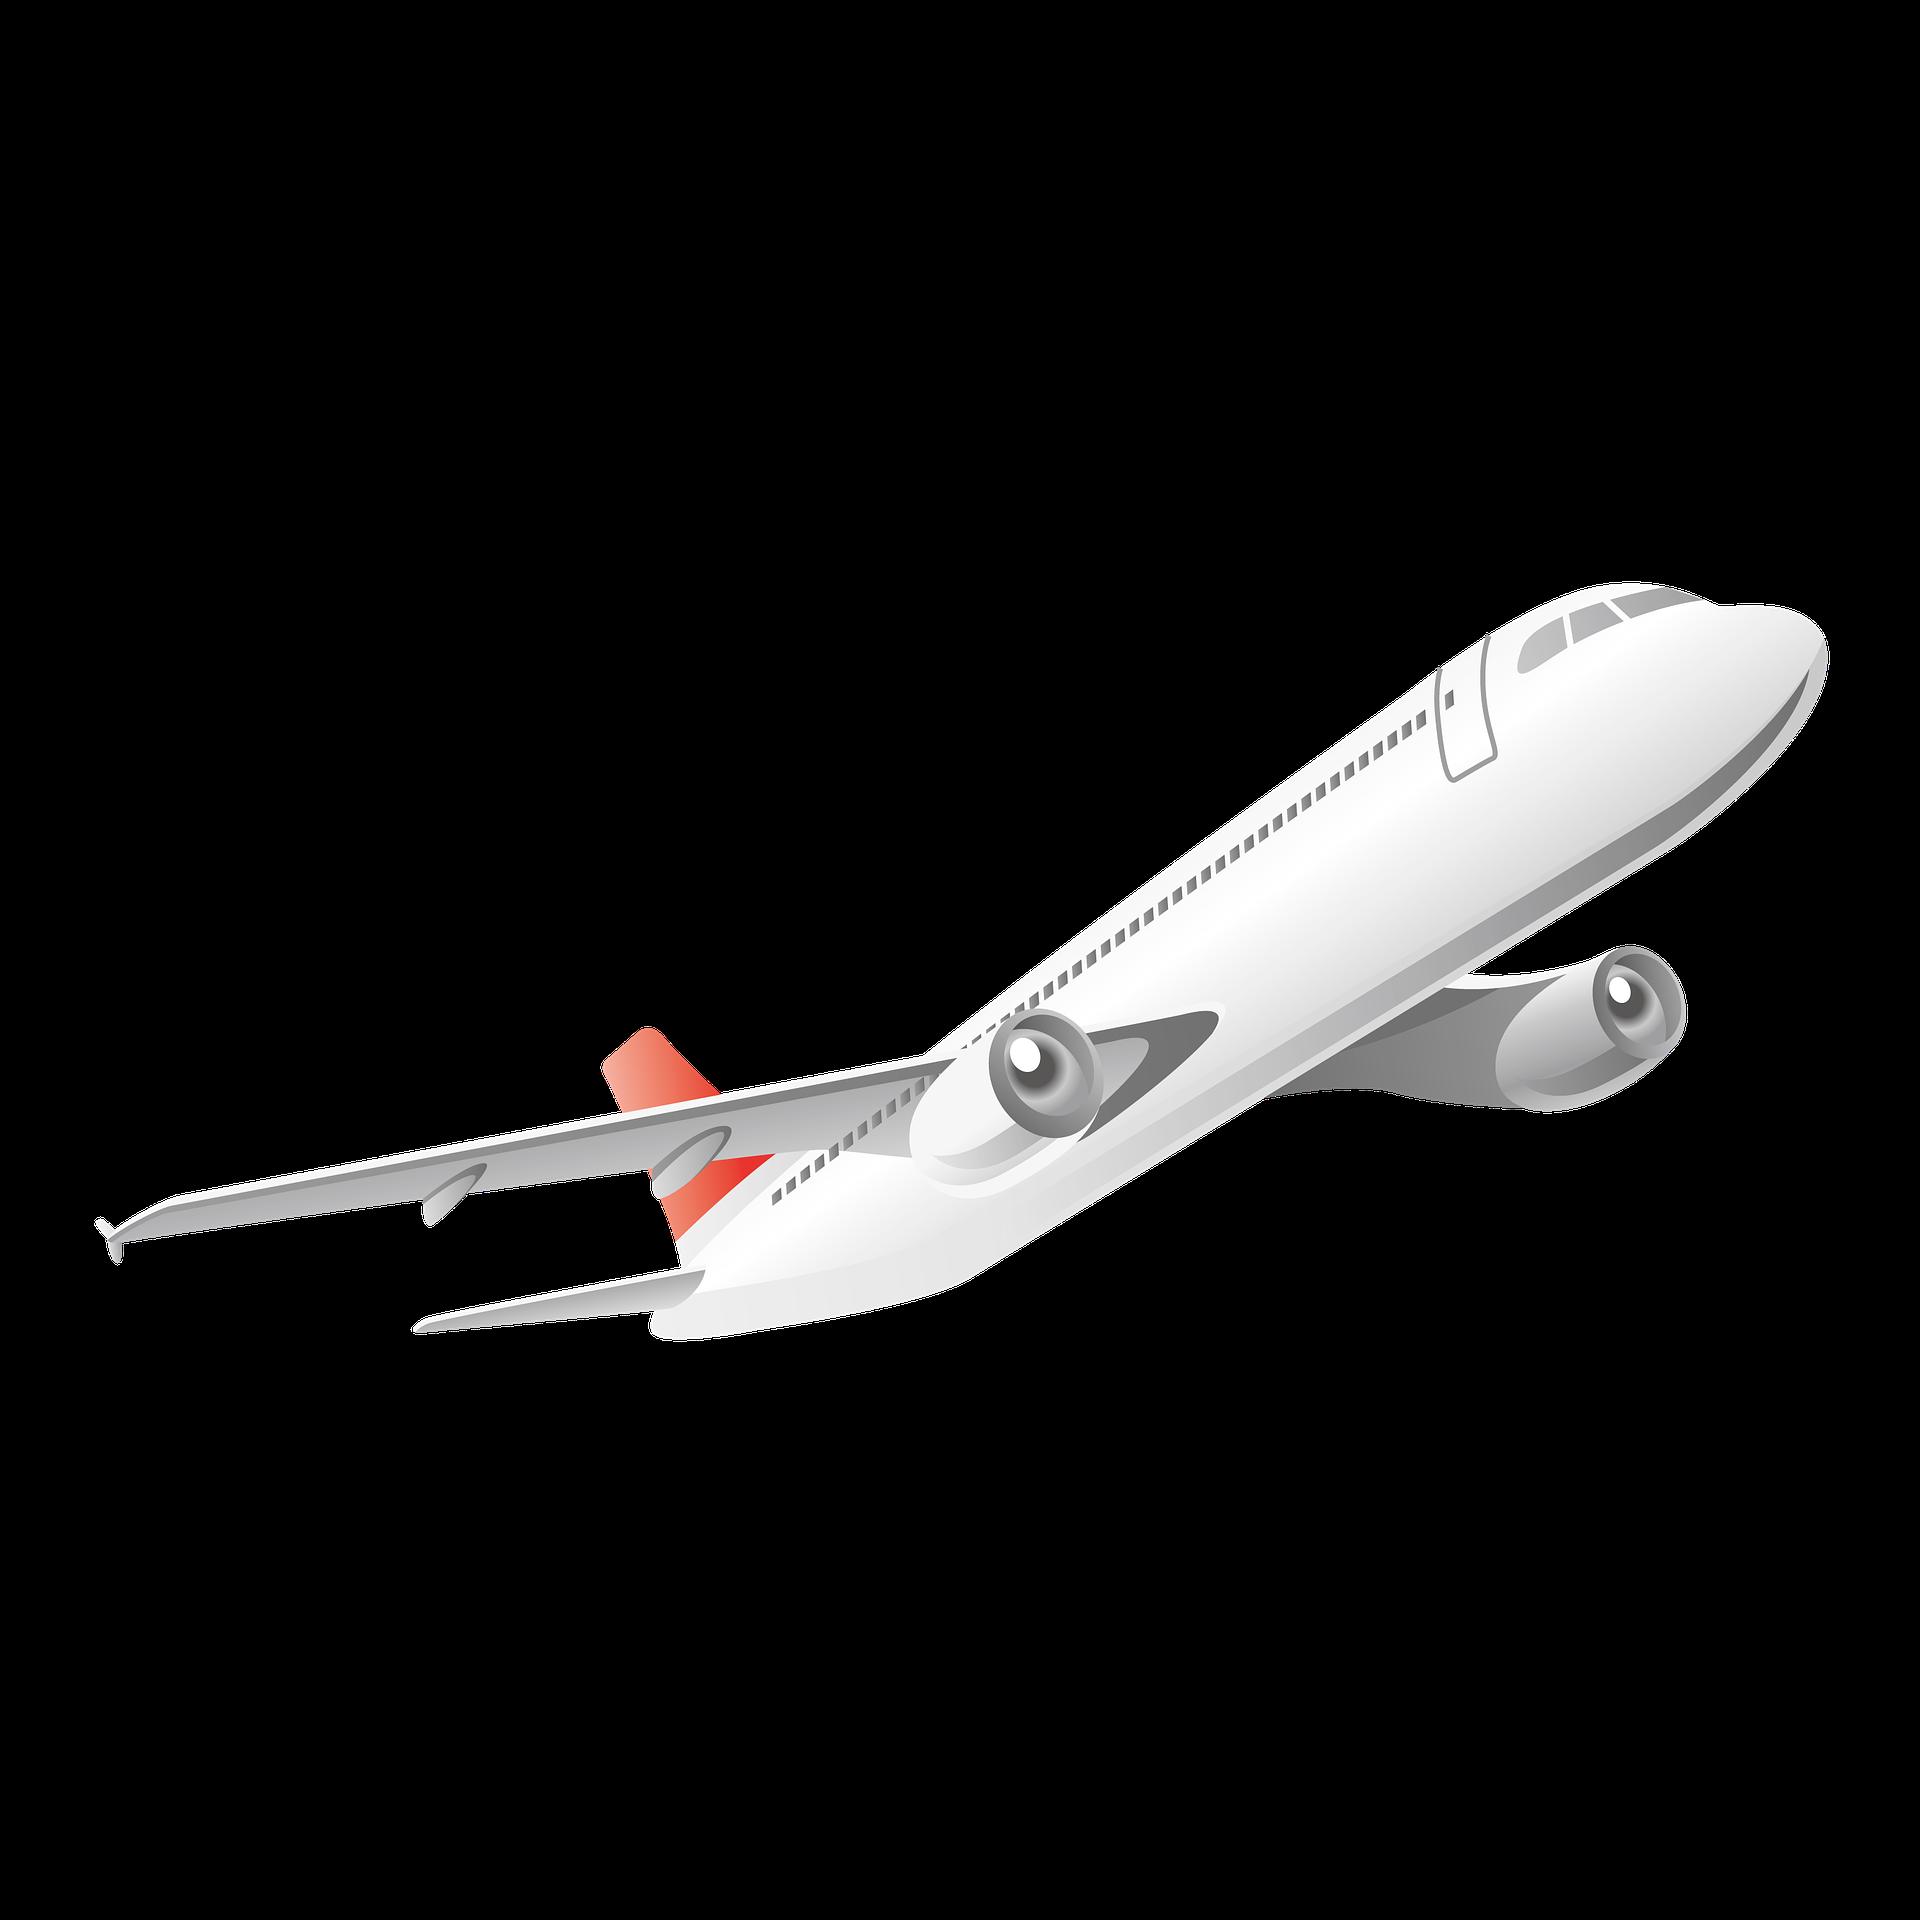 Nagaland: Civil Aviation Policy awaiting approval